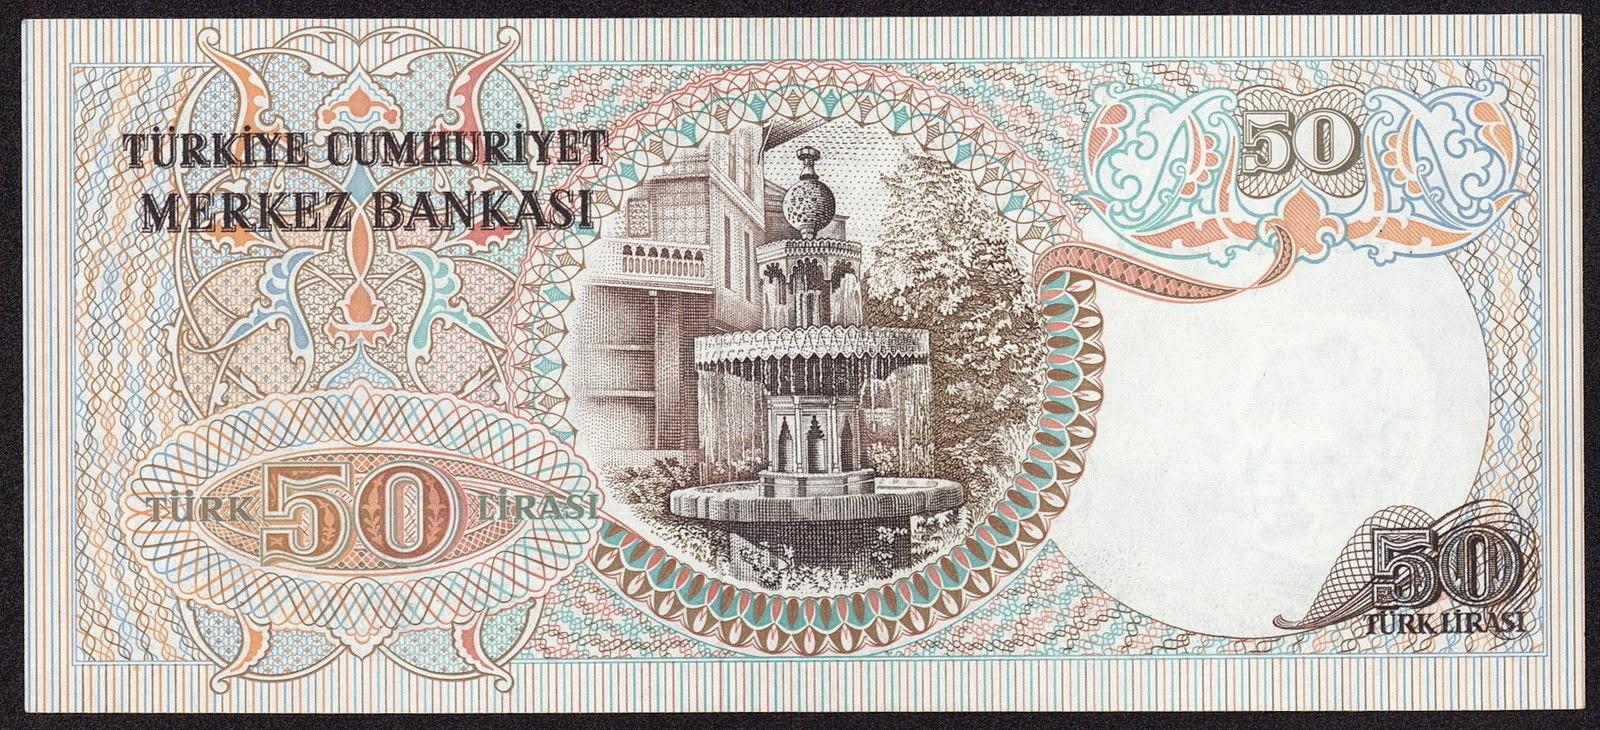 "Turkey currency money 50 Türk Lirasi ""Turkish Lira"" note, Marble Fountain in Topkapı Palace in İstanbul"